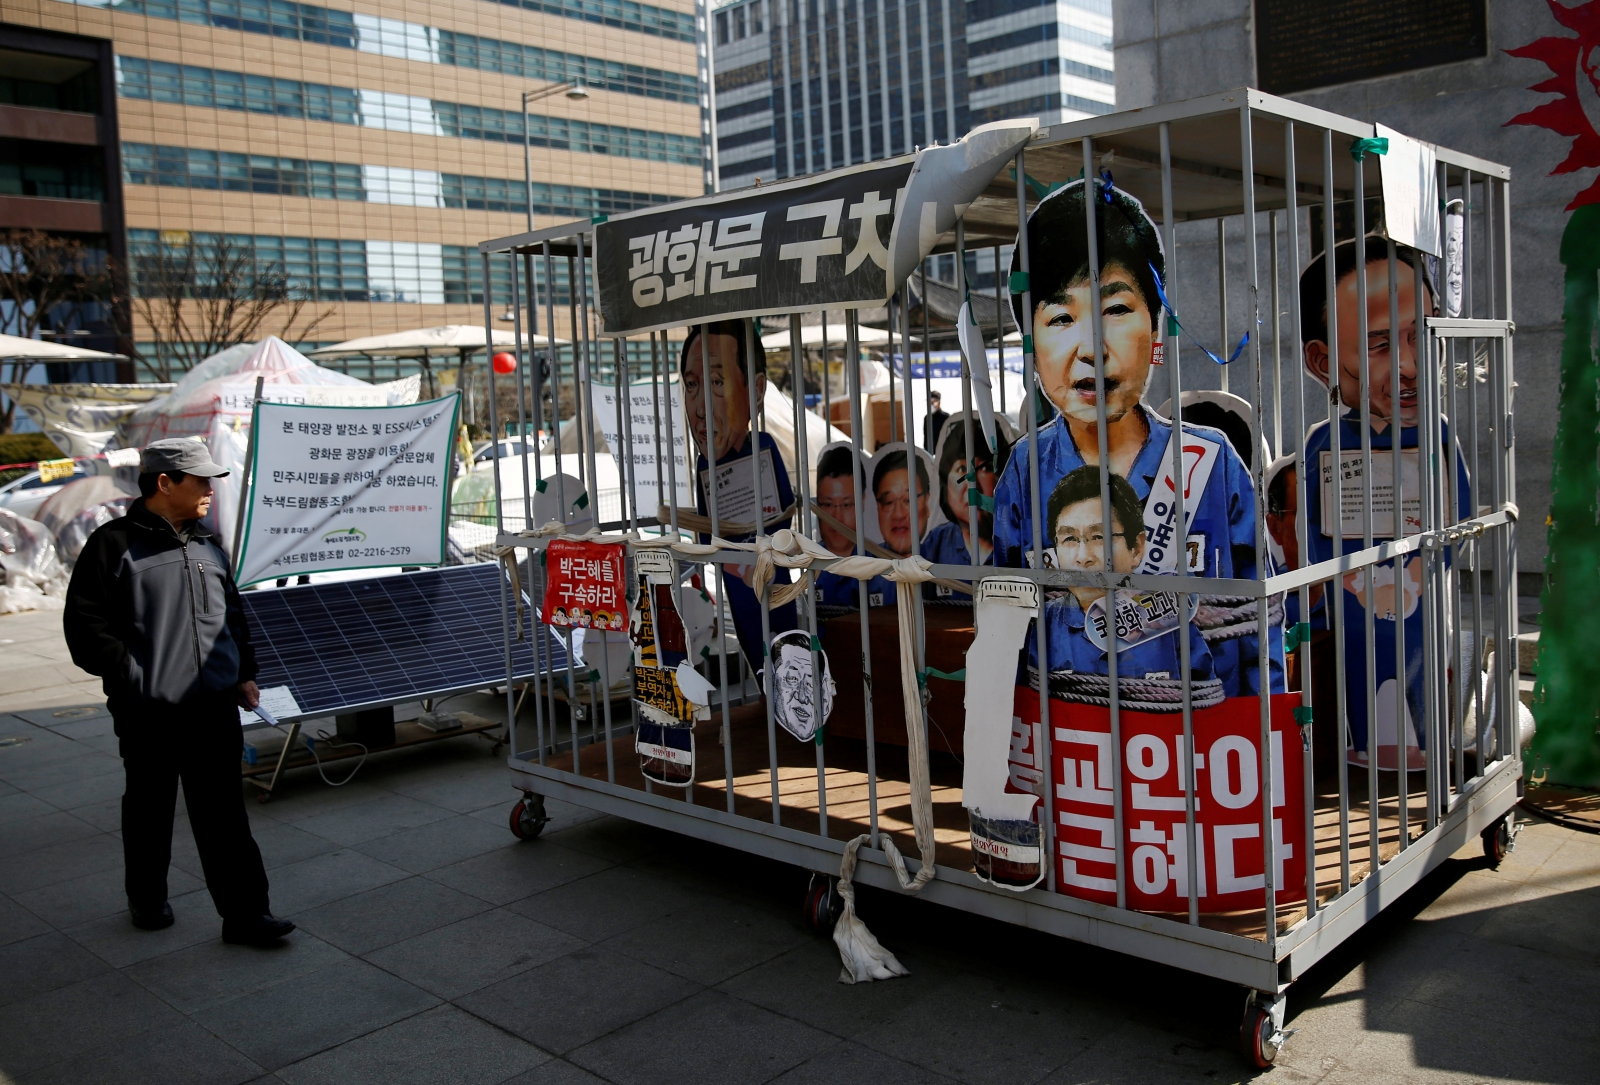 ousted leader Park Geun-hye